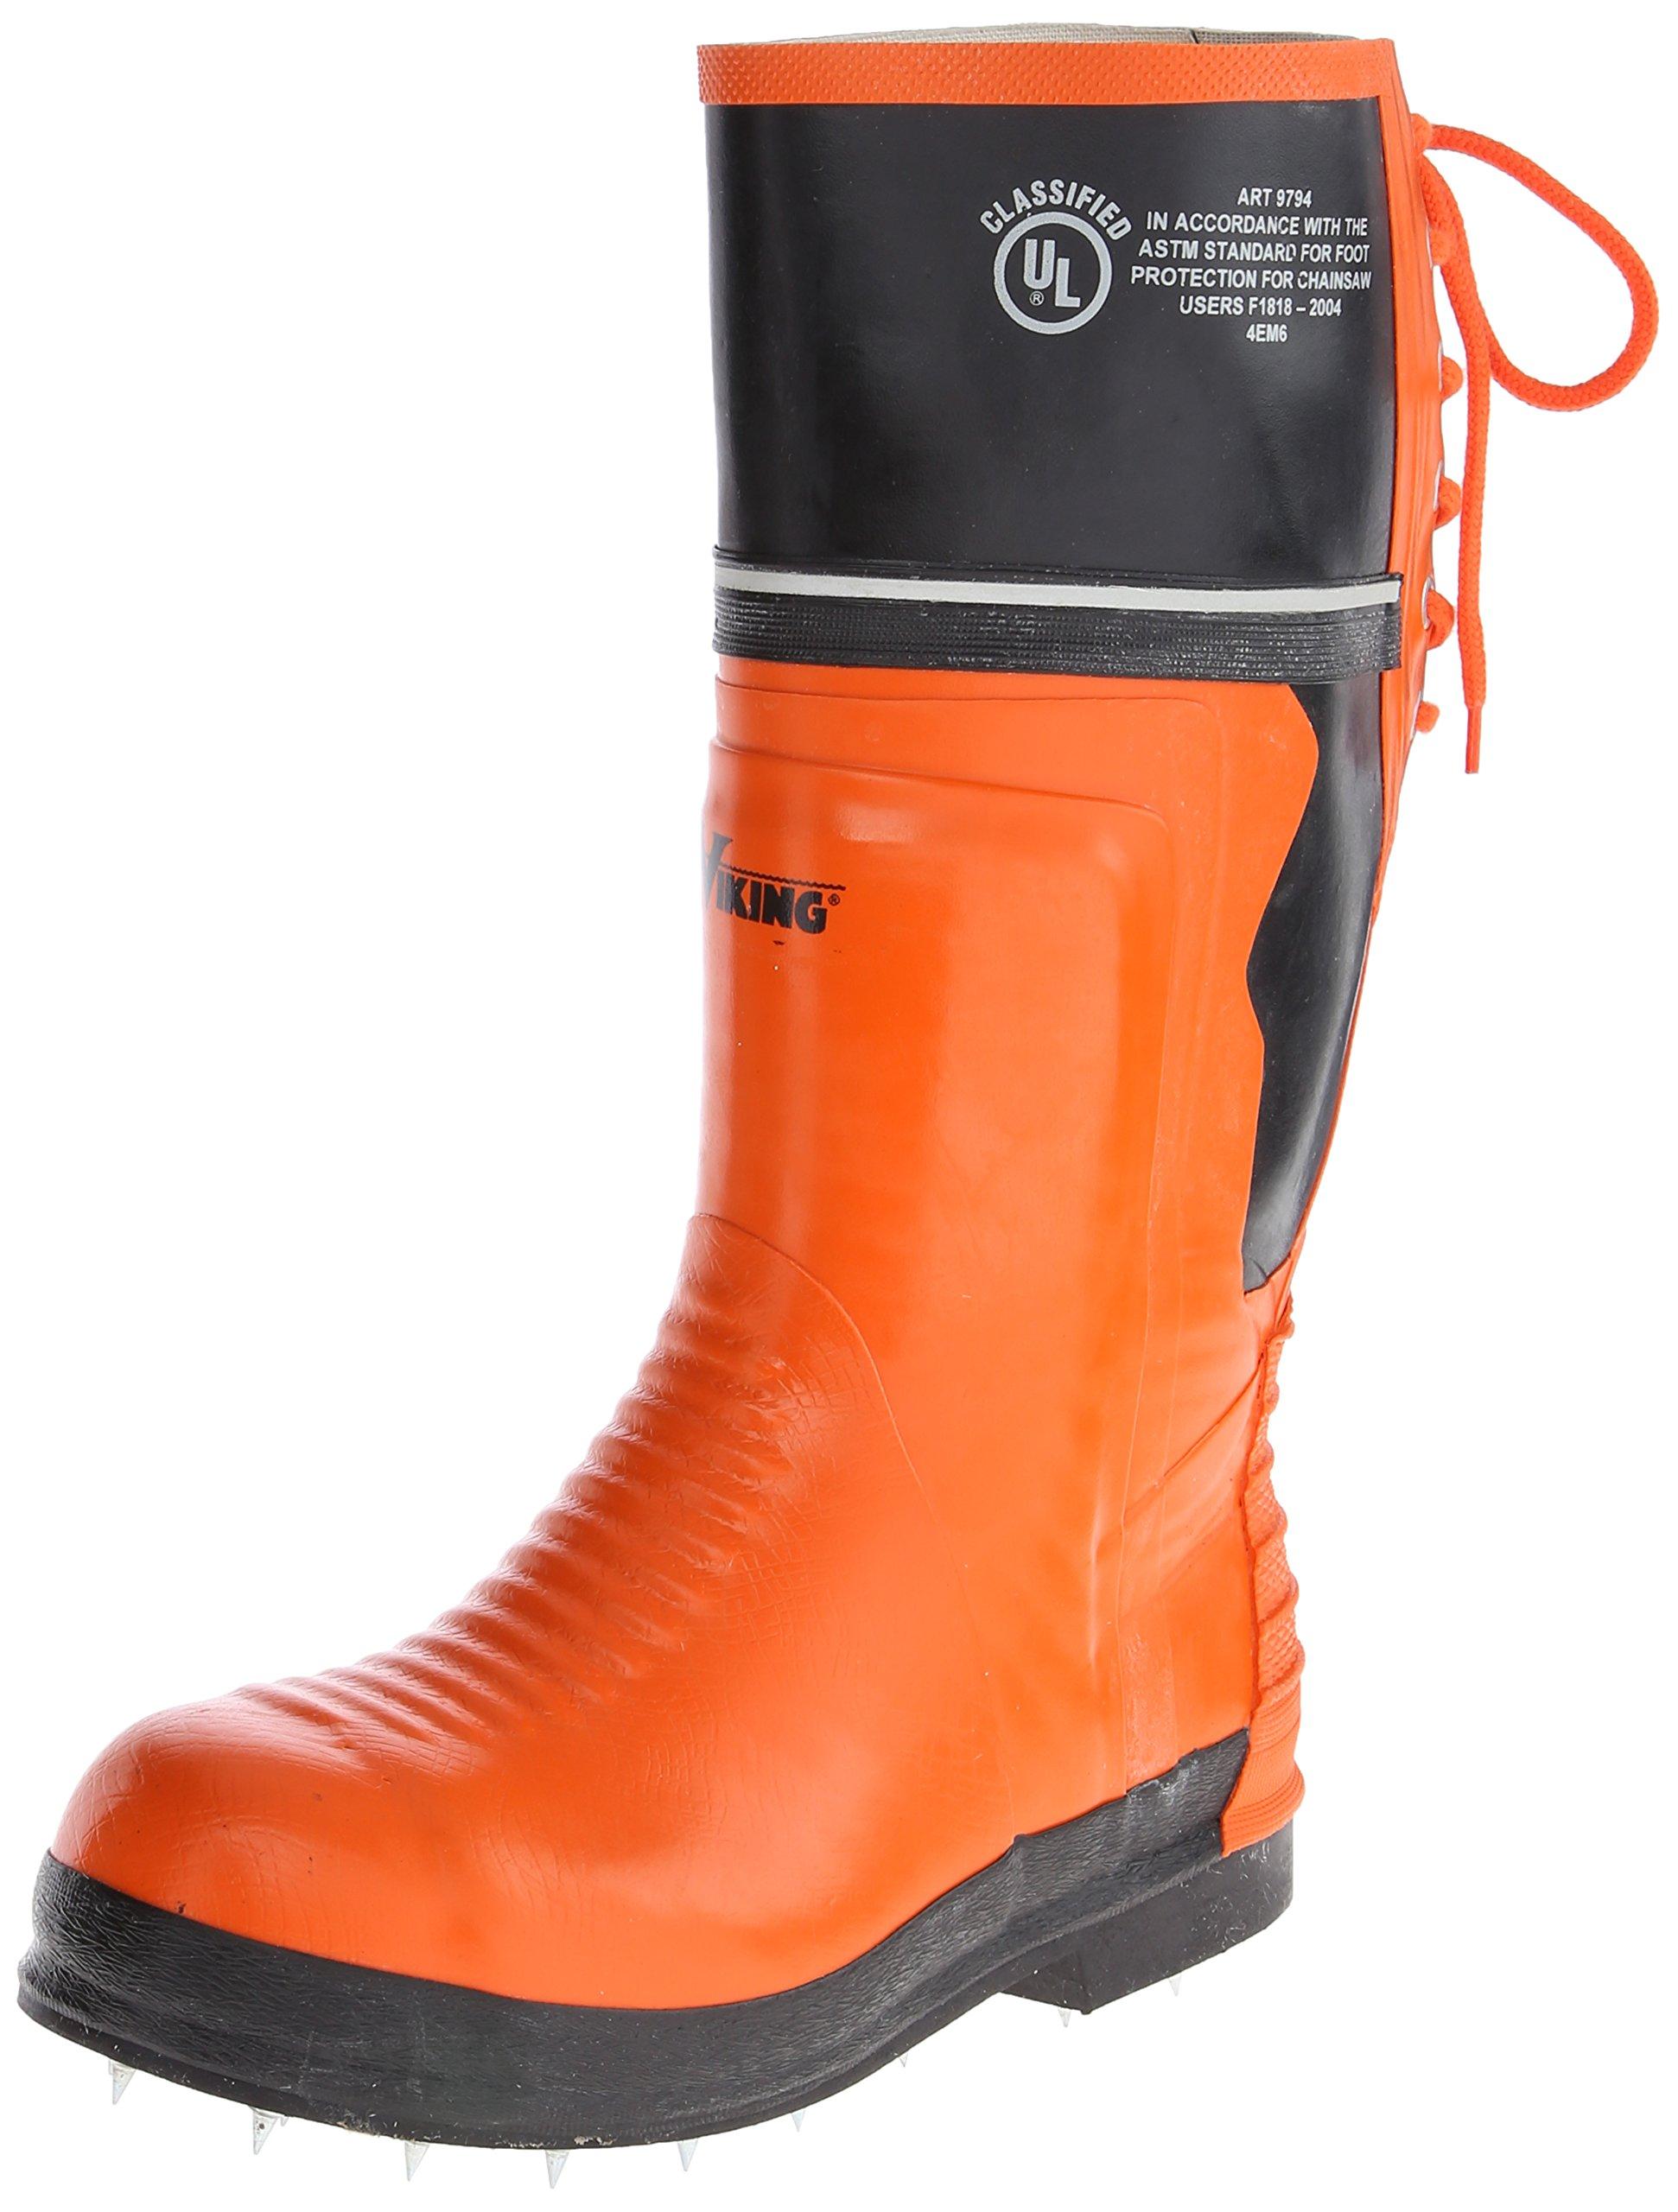 Viking Footwear Class 2 Chainsaw Caulked Boot,Orange/Black,7 M US